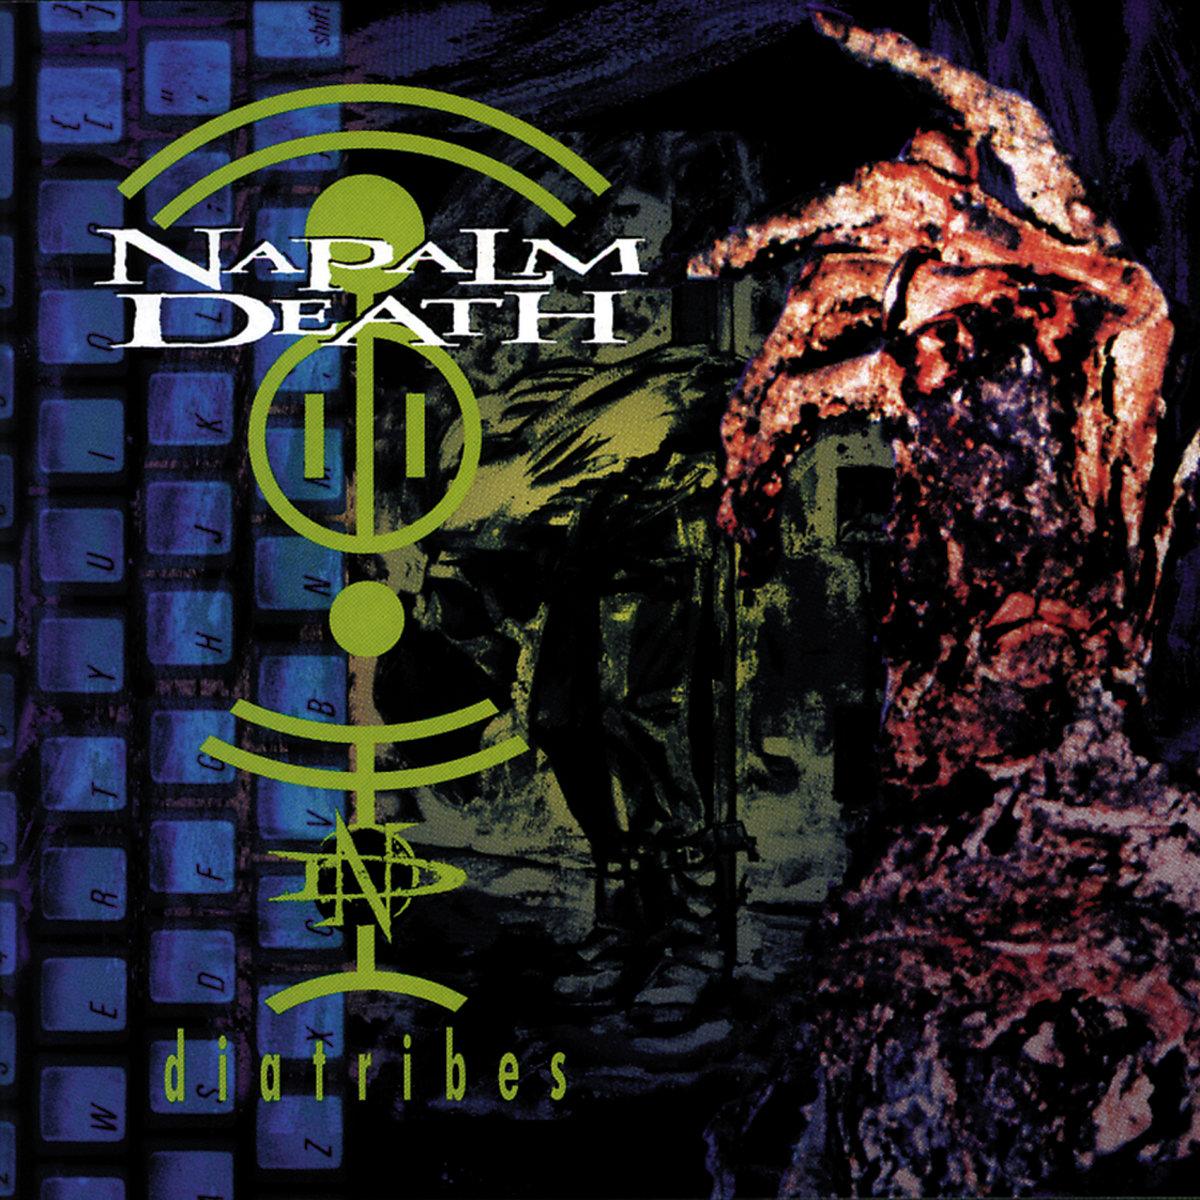 Diatribes Napalm Death